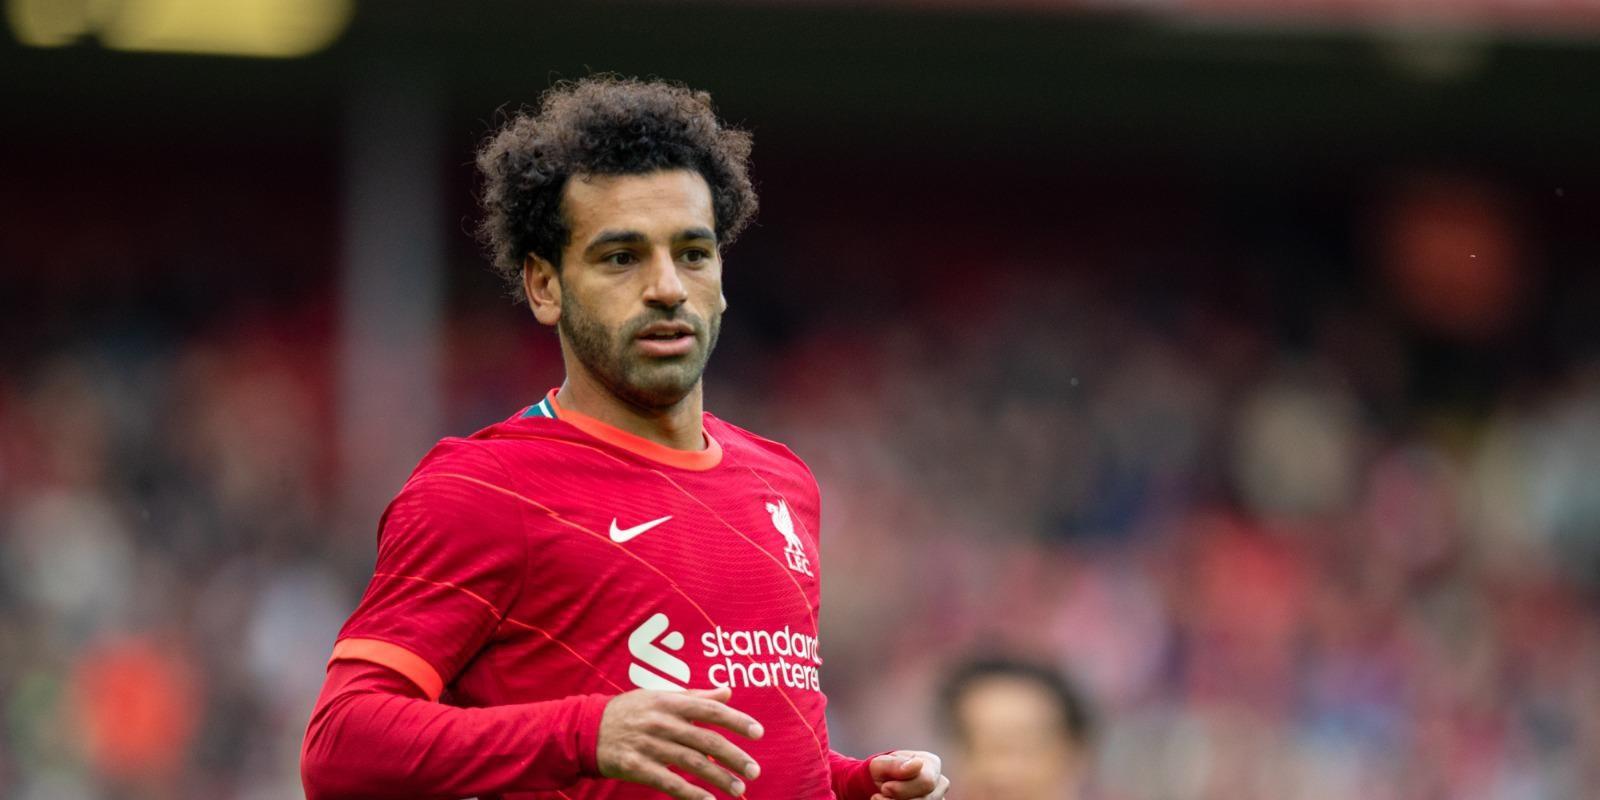 (Video) Mo Salah's hilarious fantasy Premier League brag that fans will love